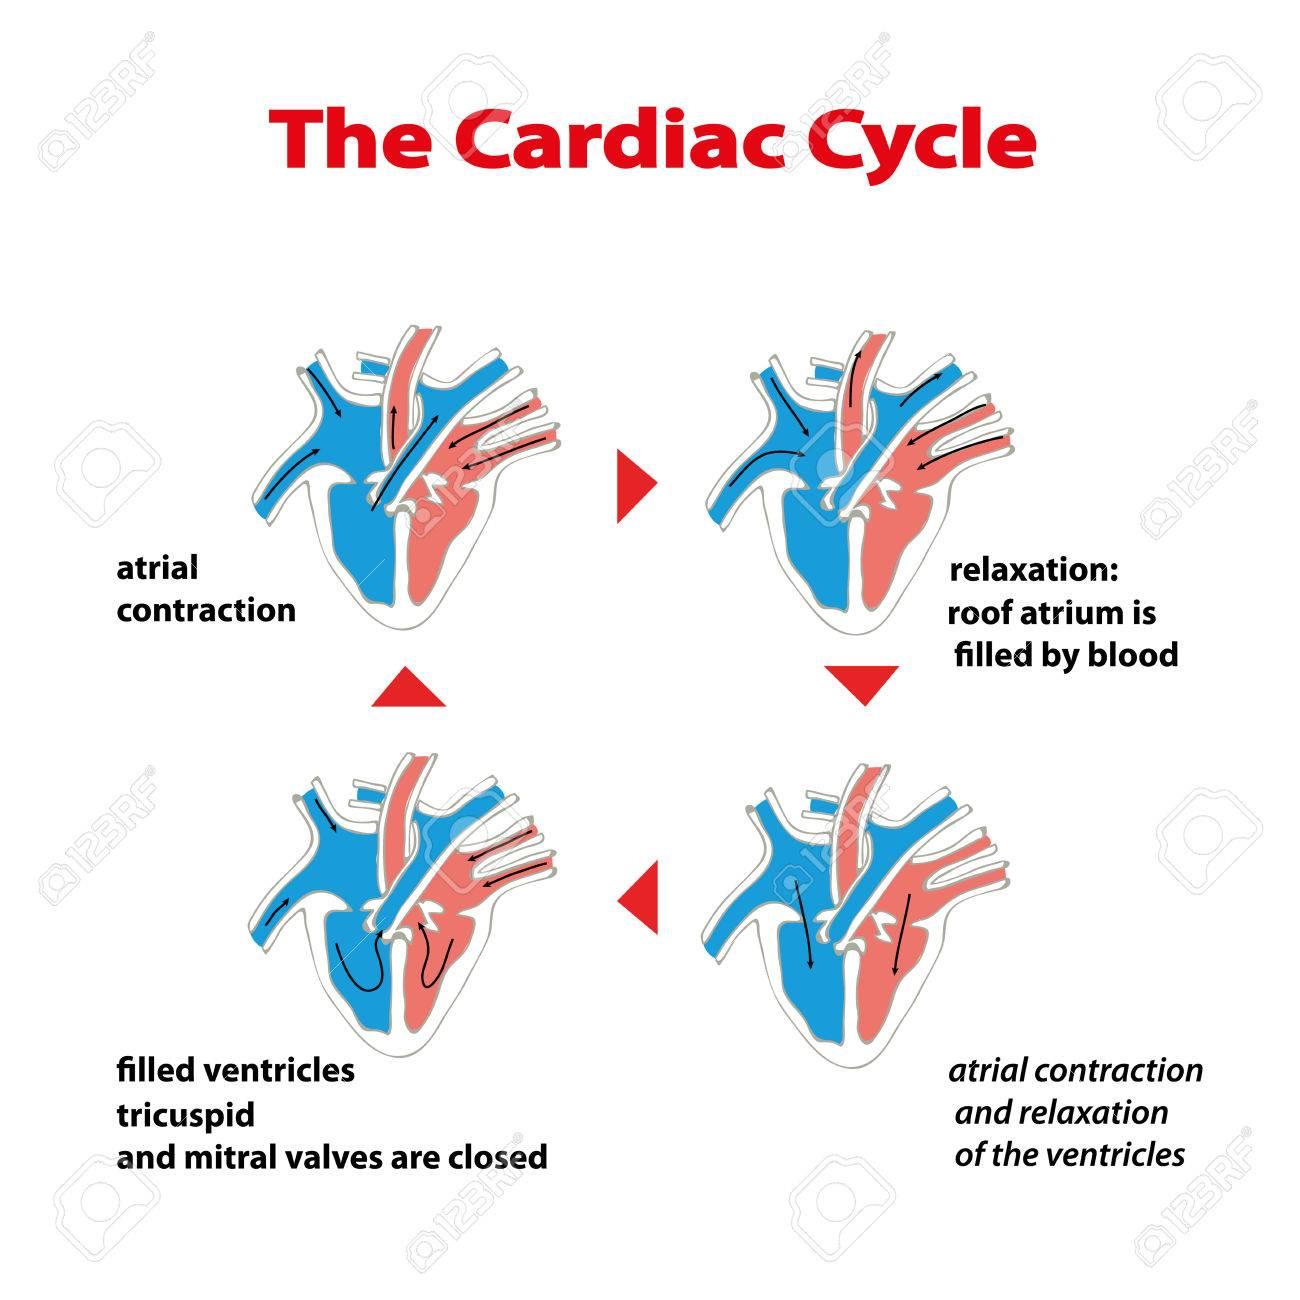 Heart cycle cardiac cycle of heart on white isolated cardiac heart cycle cardiac cycle of heart on white isolated cardiac cycle info graphic pooptronica